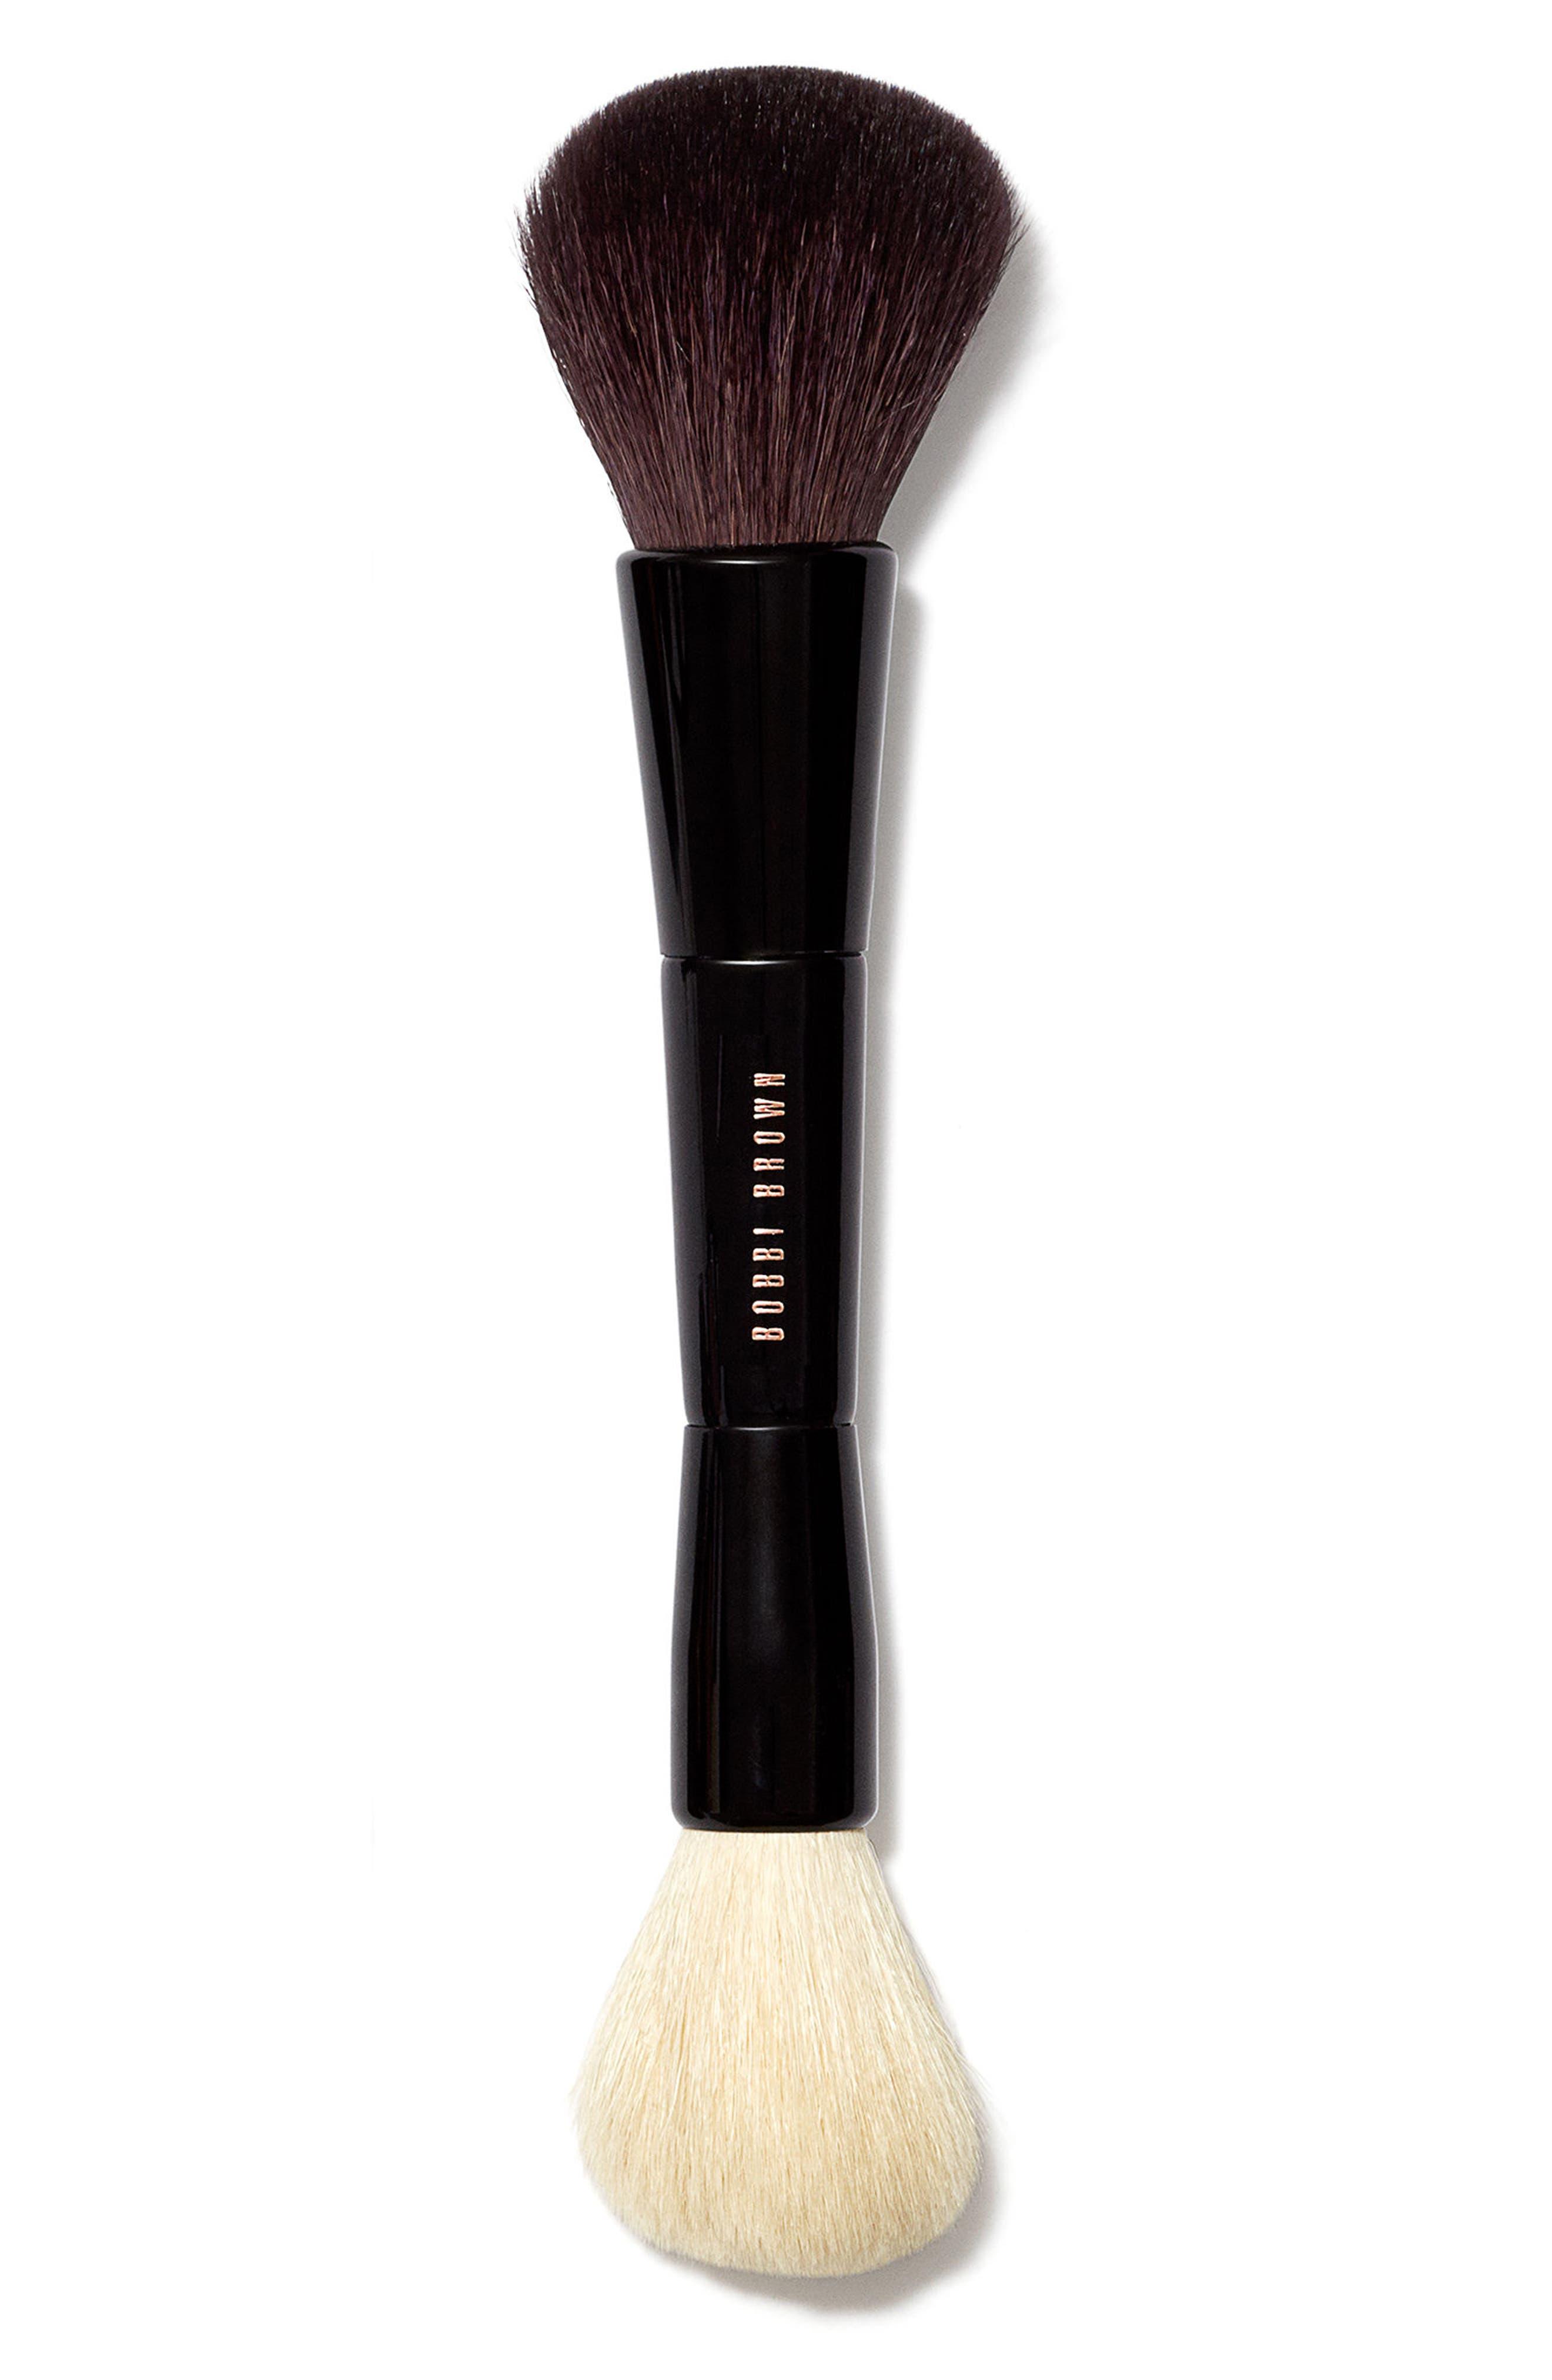 Dual Bronzer/Face Blender Brush,                             Main thumbnail 1, color,